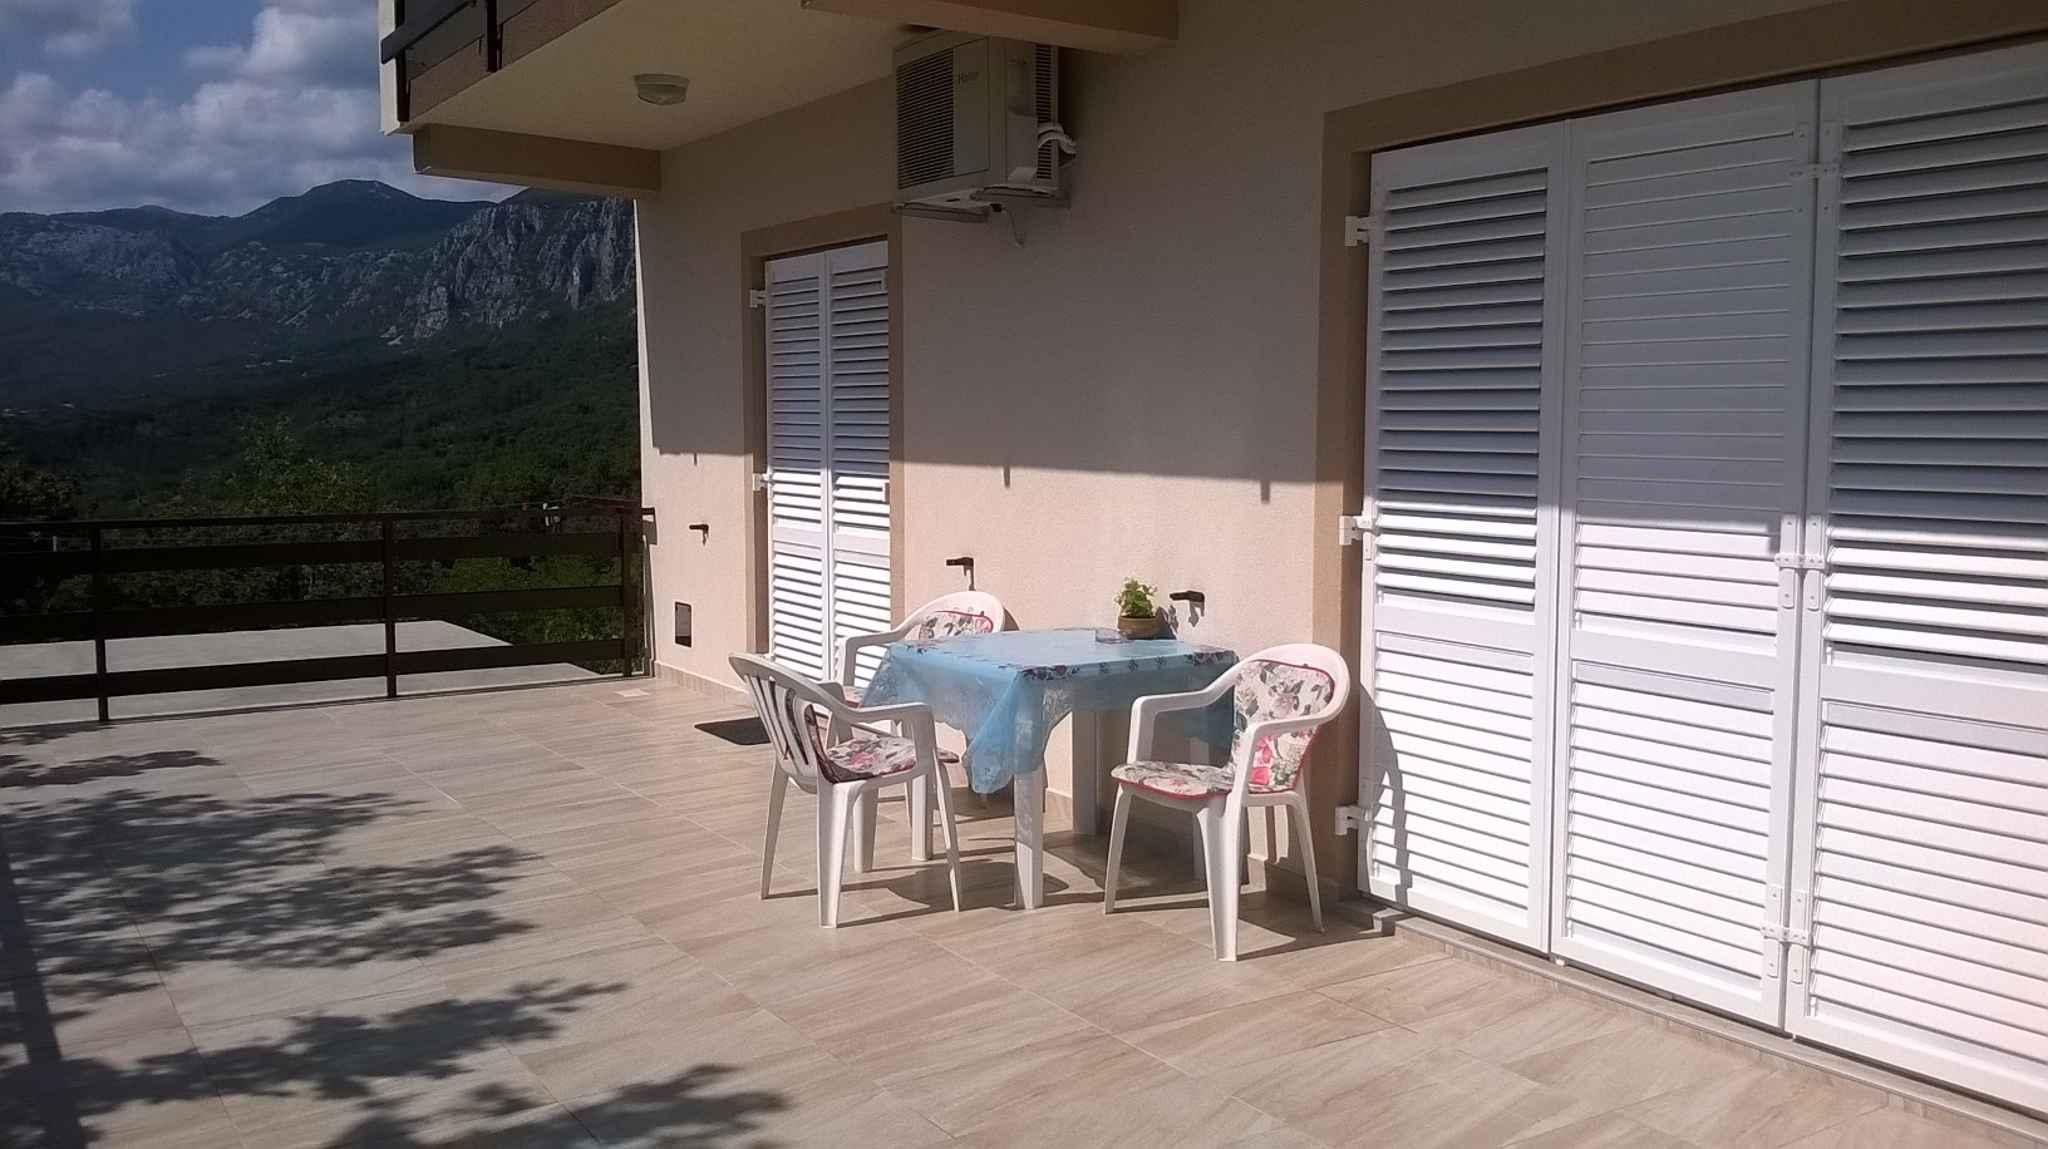 Appartement de vacances s ljetnom kuhinjom i bazenom (648047), Grižane, , Kvarner, Croatie, image 4